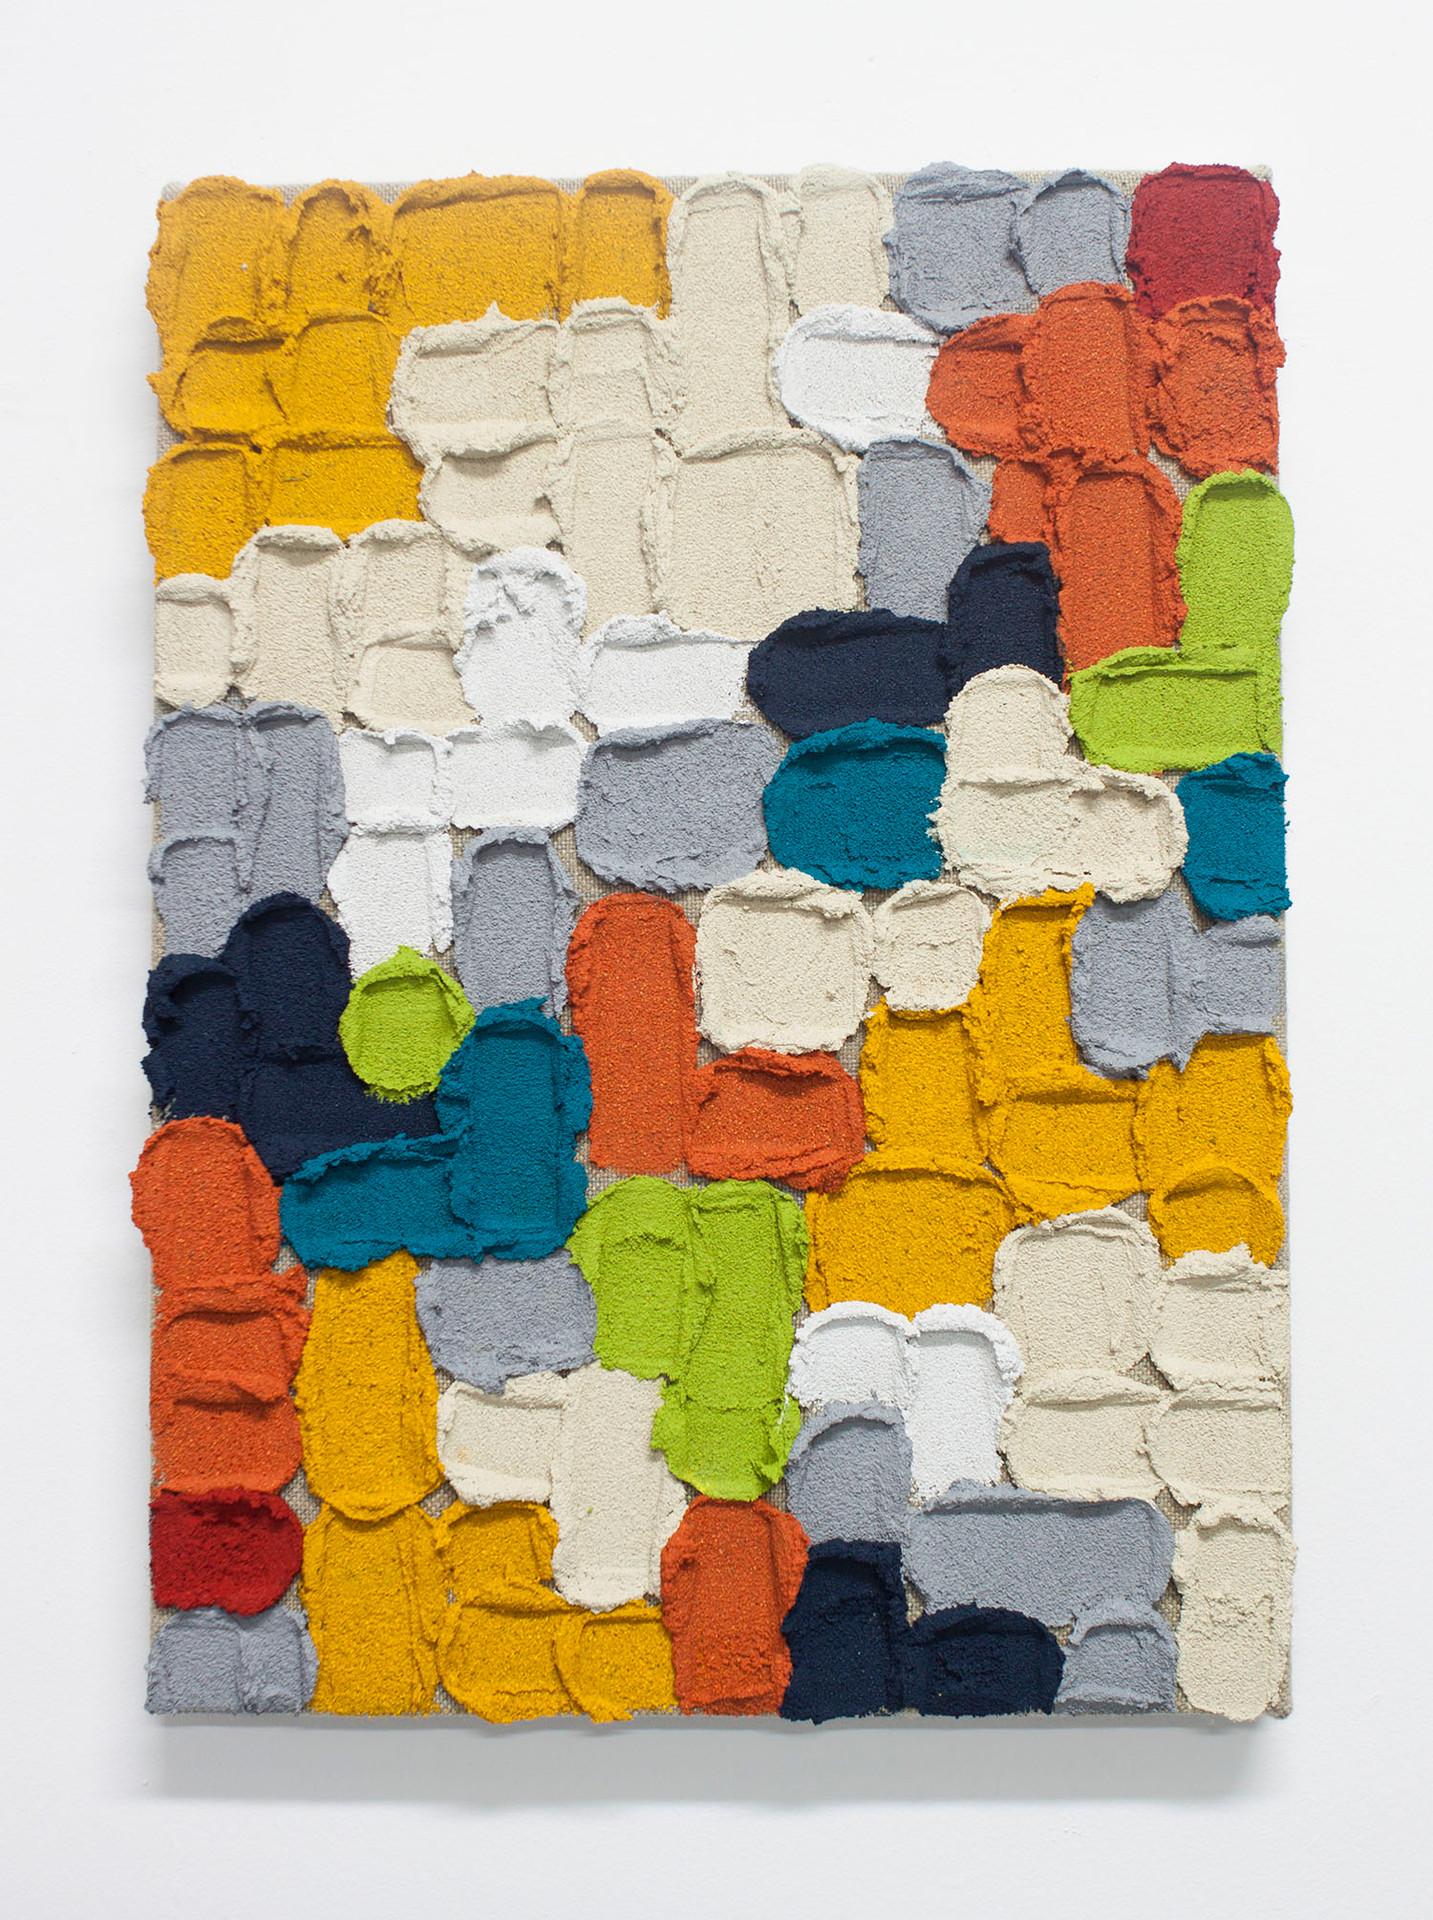 Pintura O012, 2019. Acrylic, sand and limestone on linen. 46 x 33 cm.